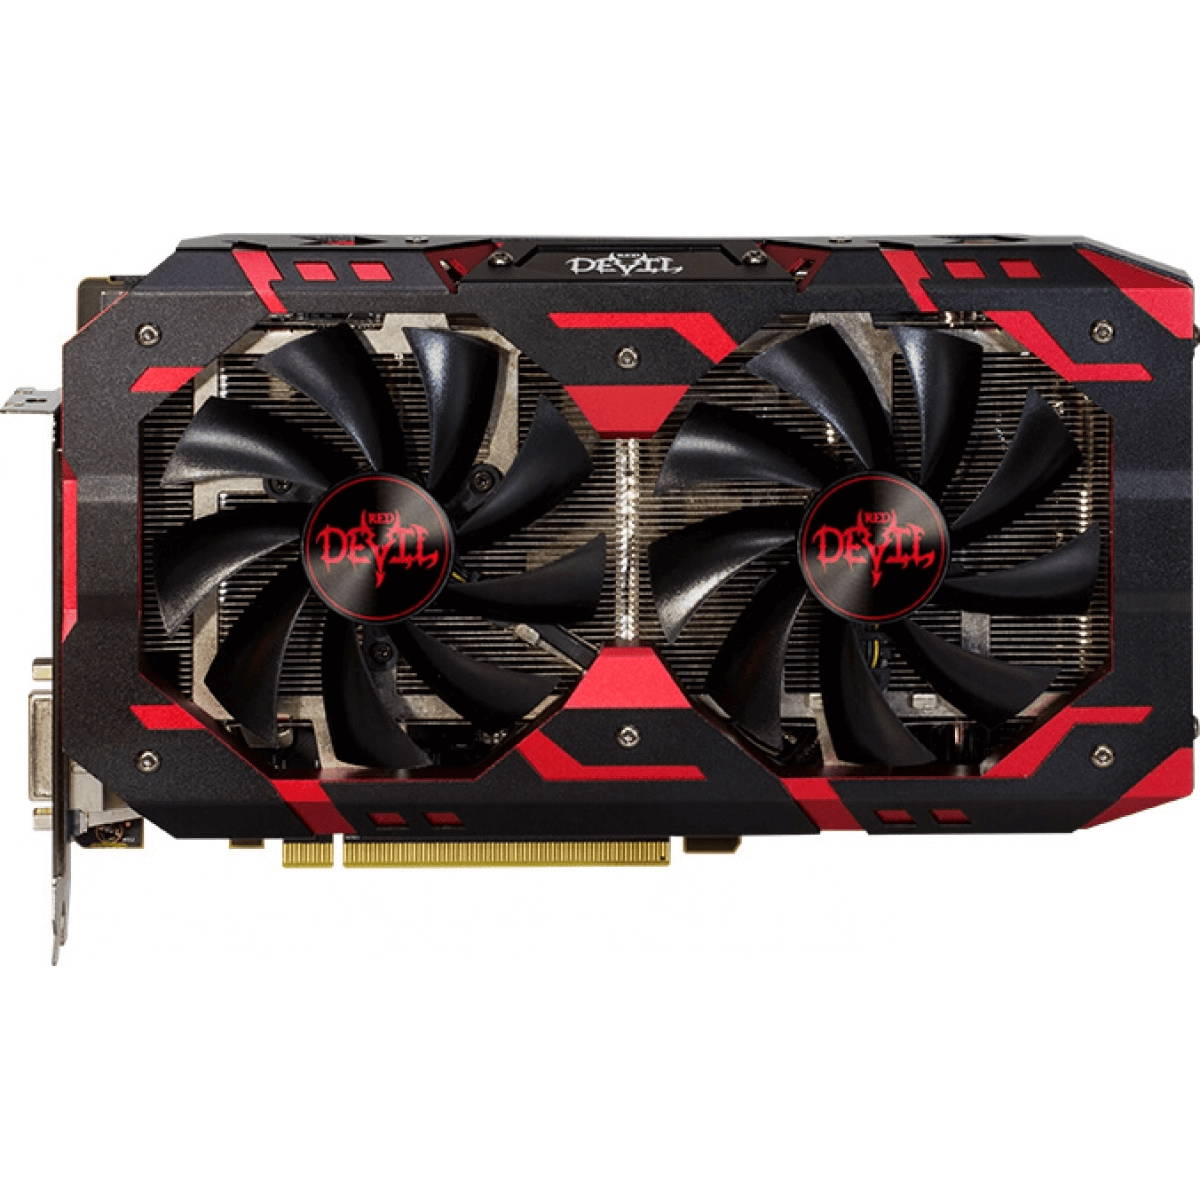 Kit Upgrade PowerColor RX 580 Red Devil + AMD Ryzen 7 5800X + Brinde Jogo Dirt 5